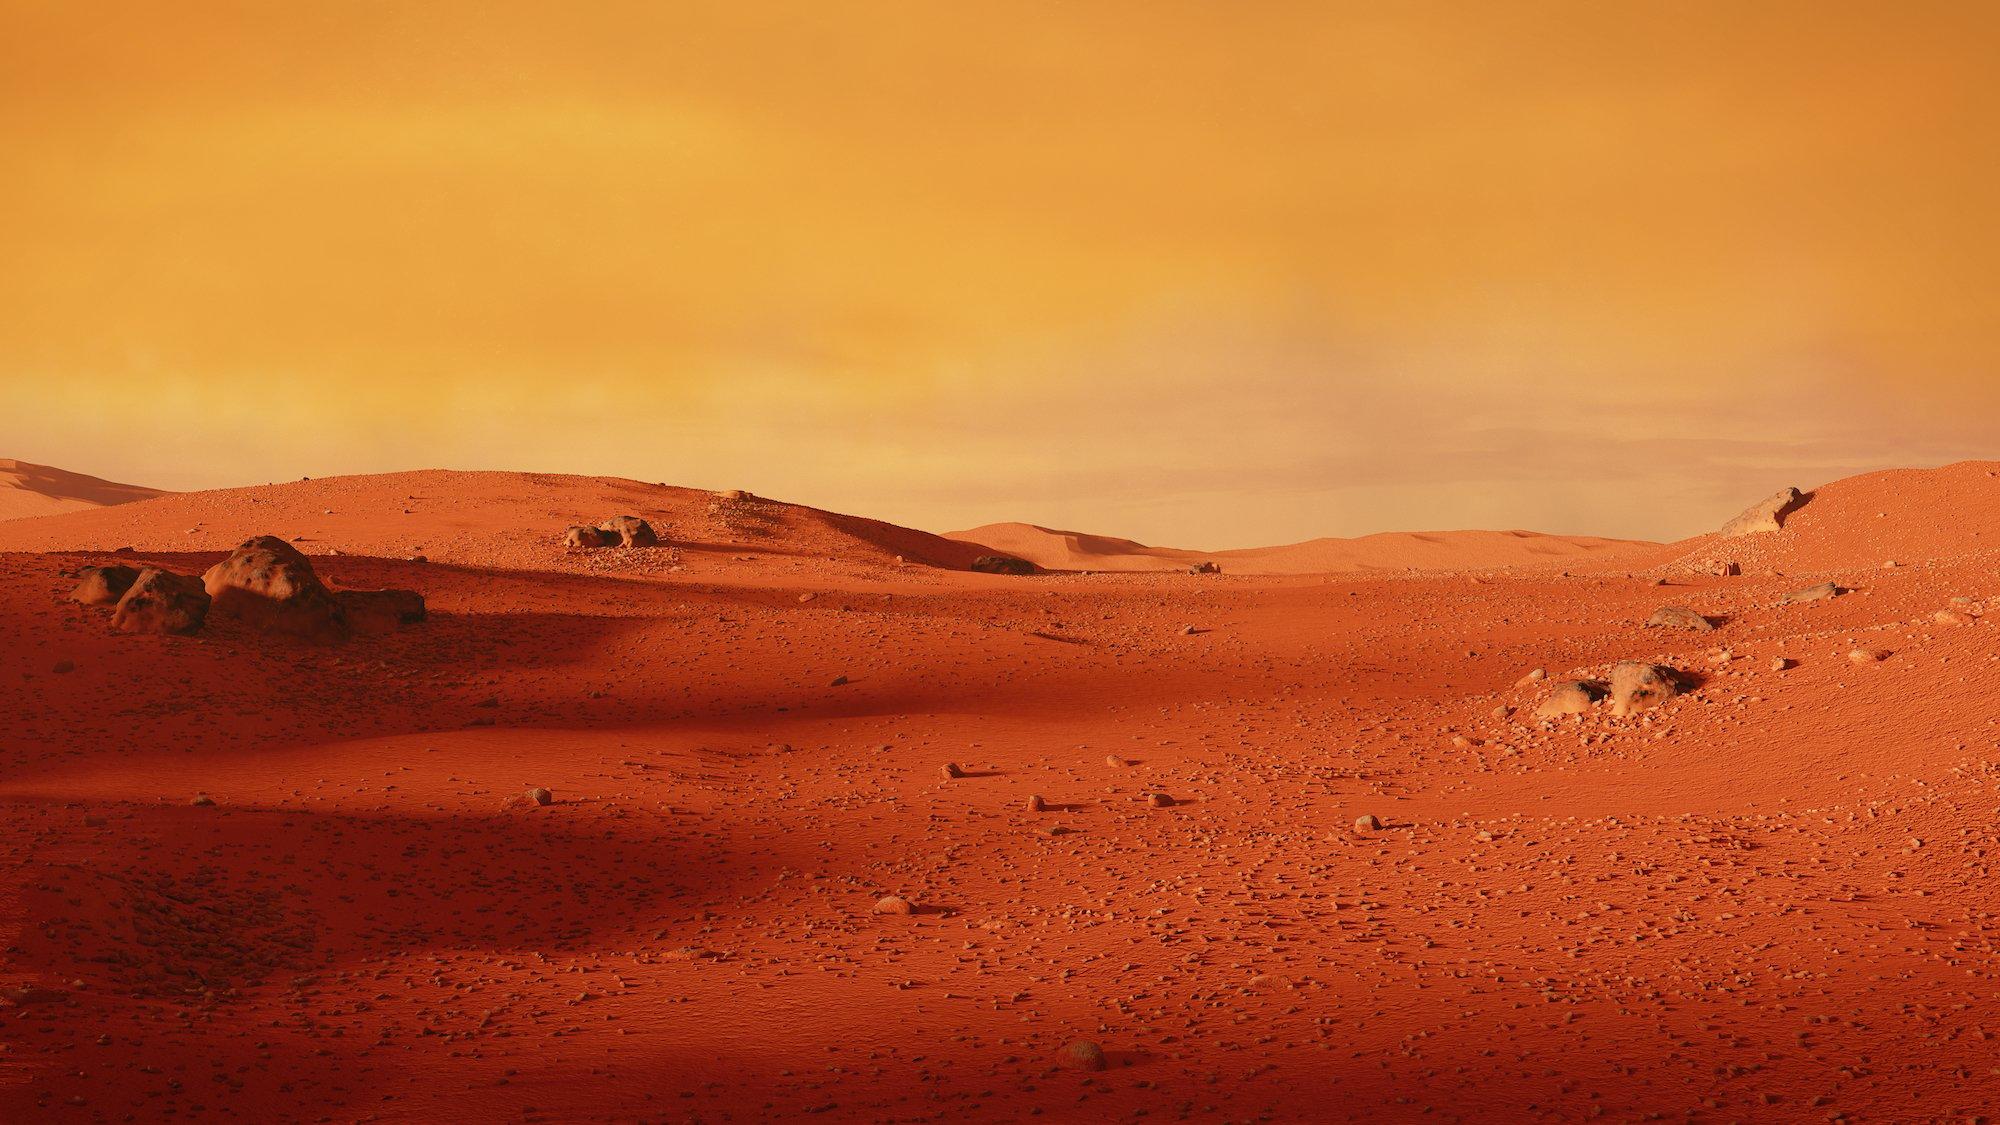 火星表面示意圖。(ShutterStock)